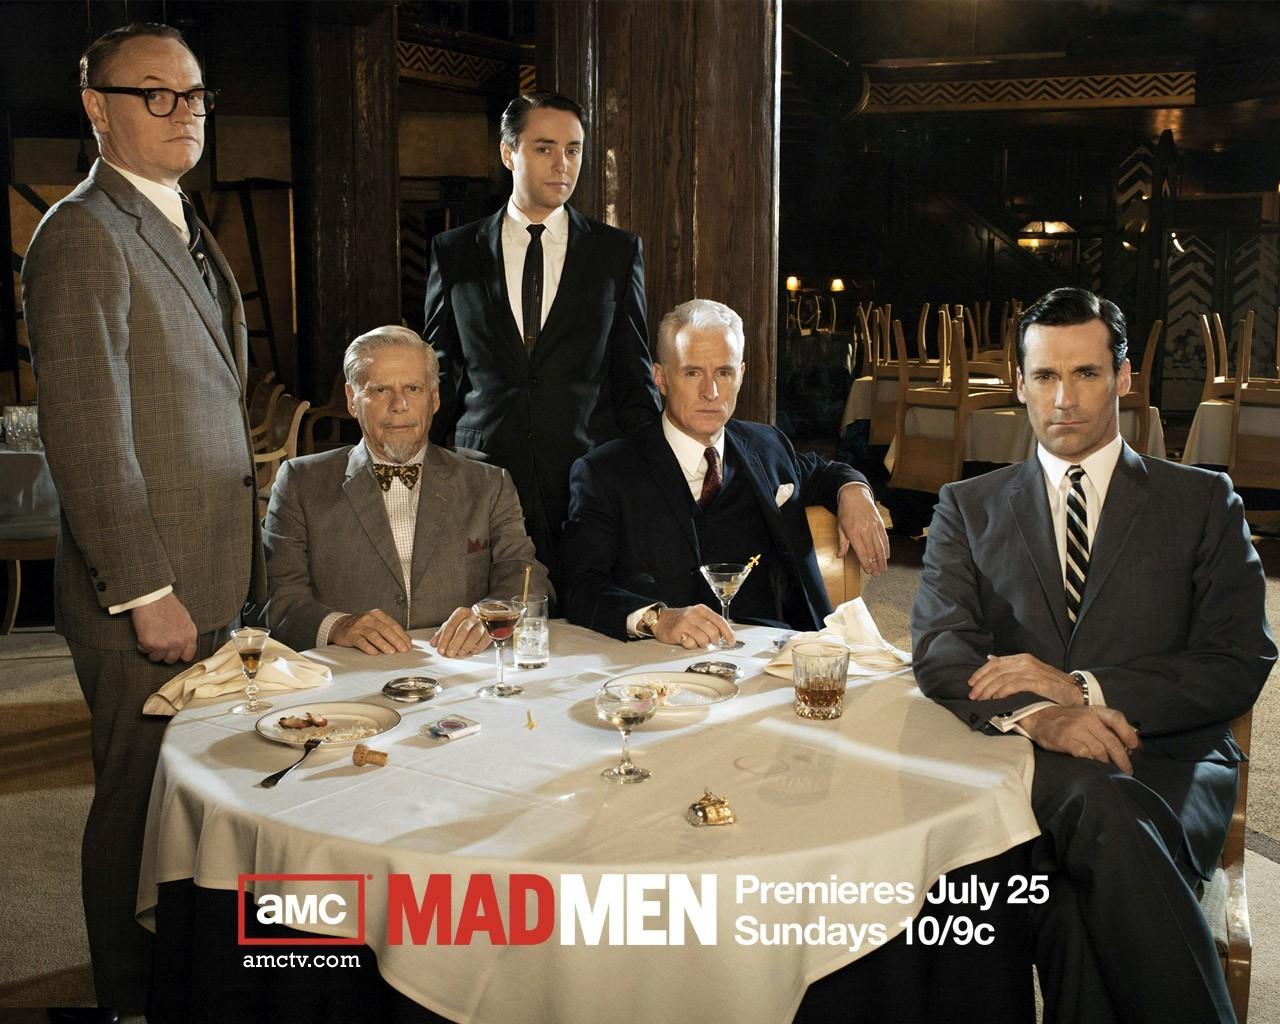 Mad Men Wallpapers - Mad Men Wallpaper (26230313) - Fanpop